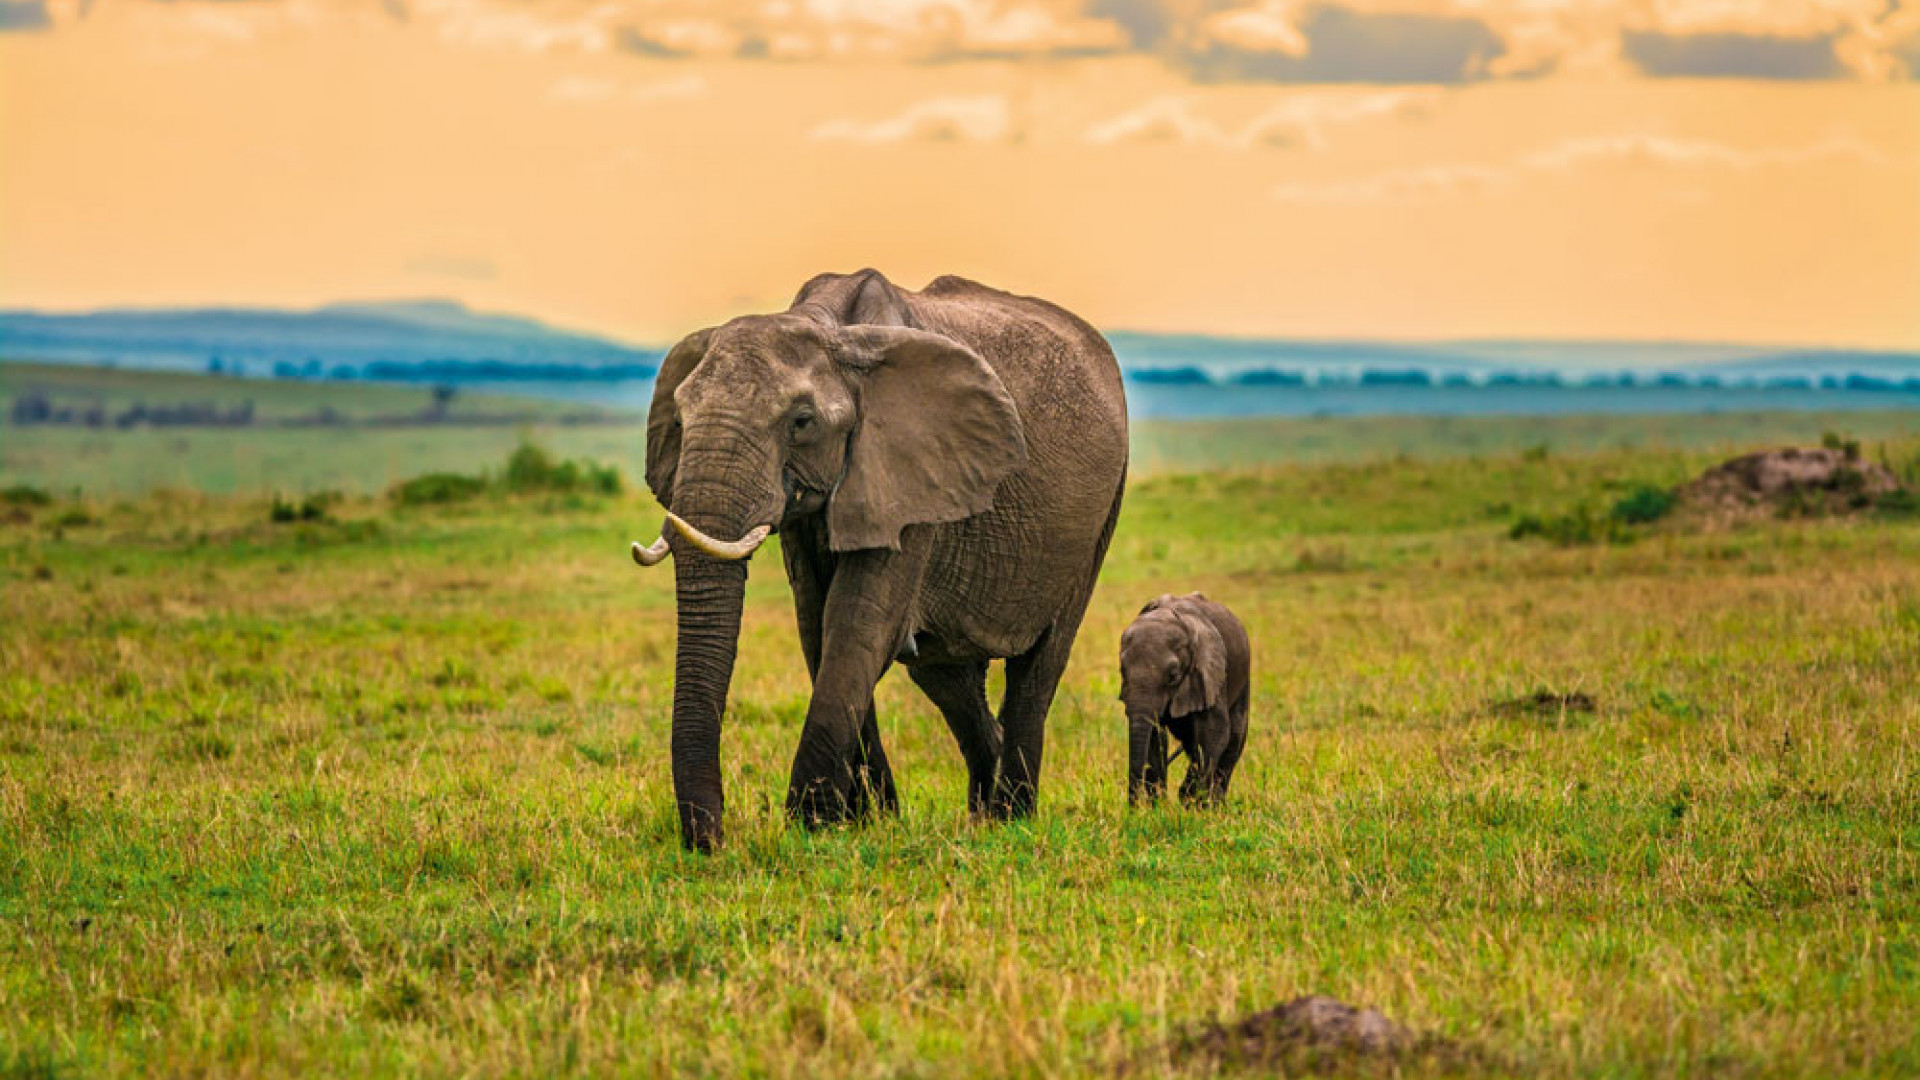 Elephants in a Kenyan game reserve